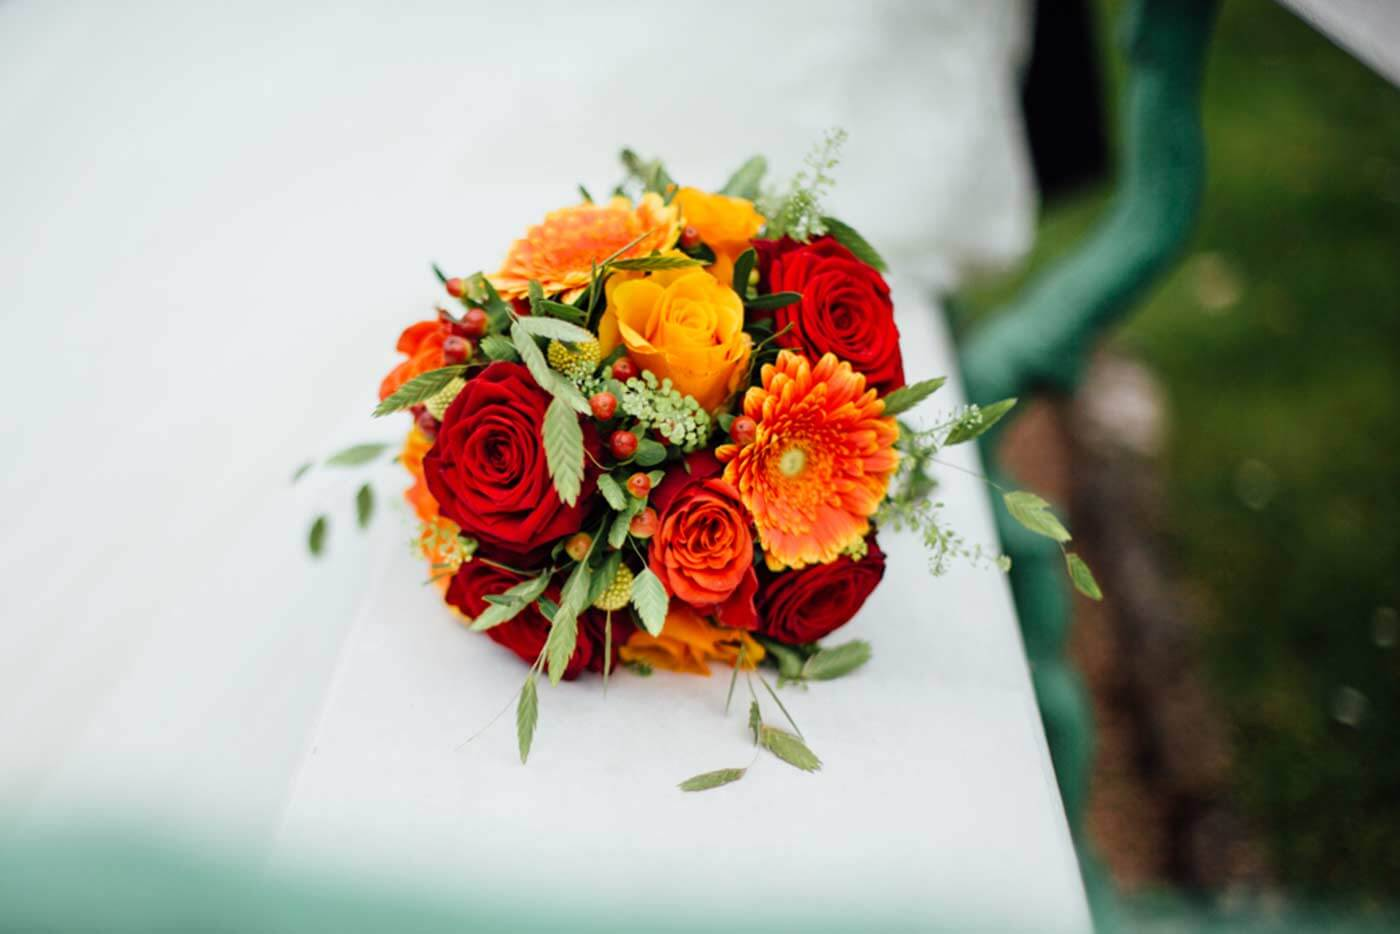 Brautstrau in Orange  Rot  Groe Bildergalerie mit